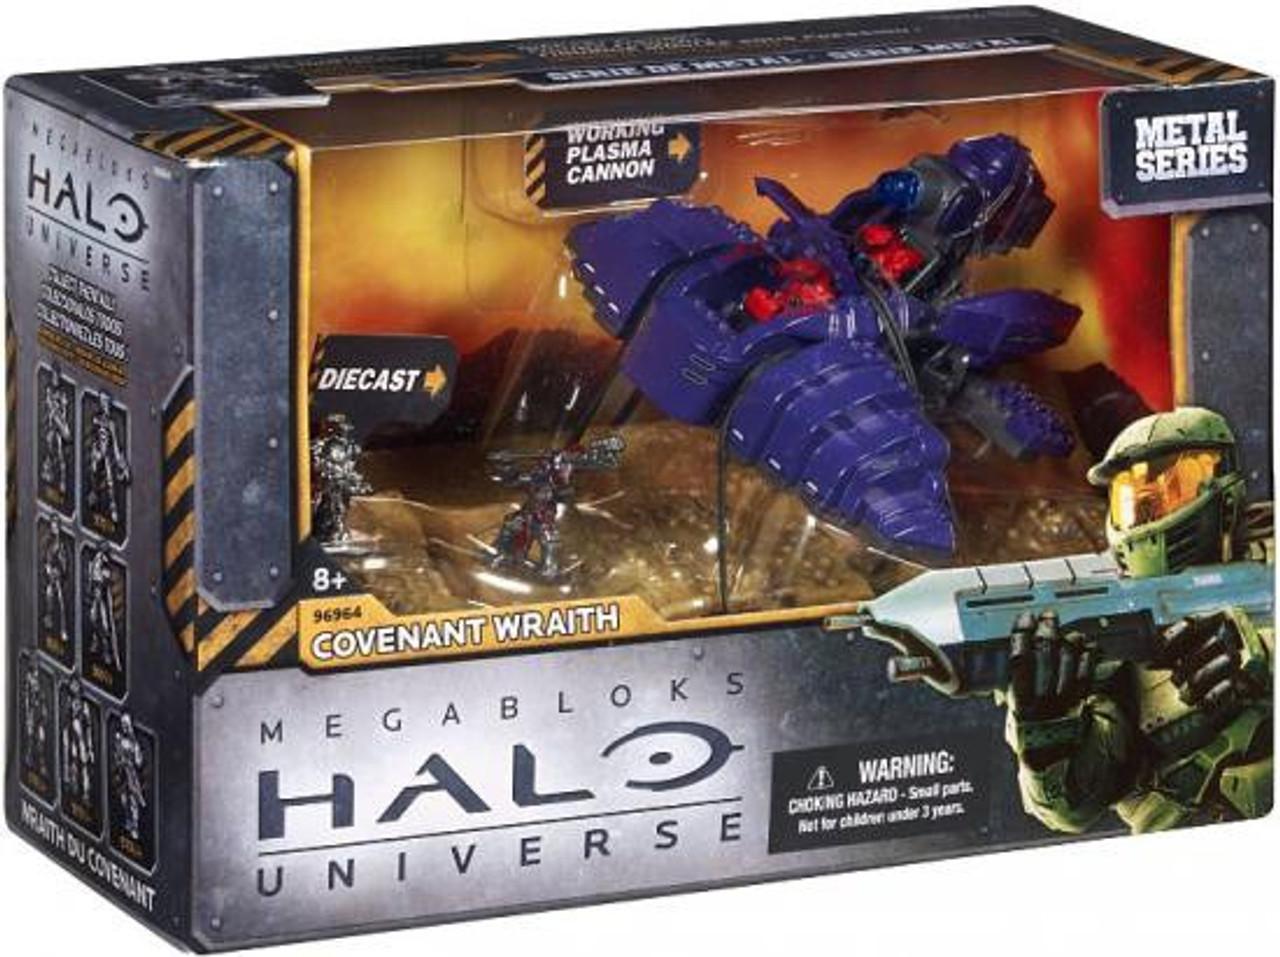 Mega Bloks Halo Metal Series Covenant Wraith Set #96964